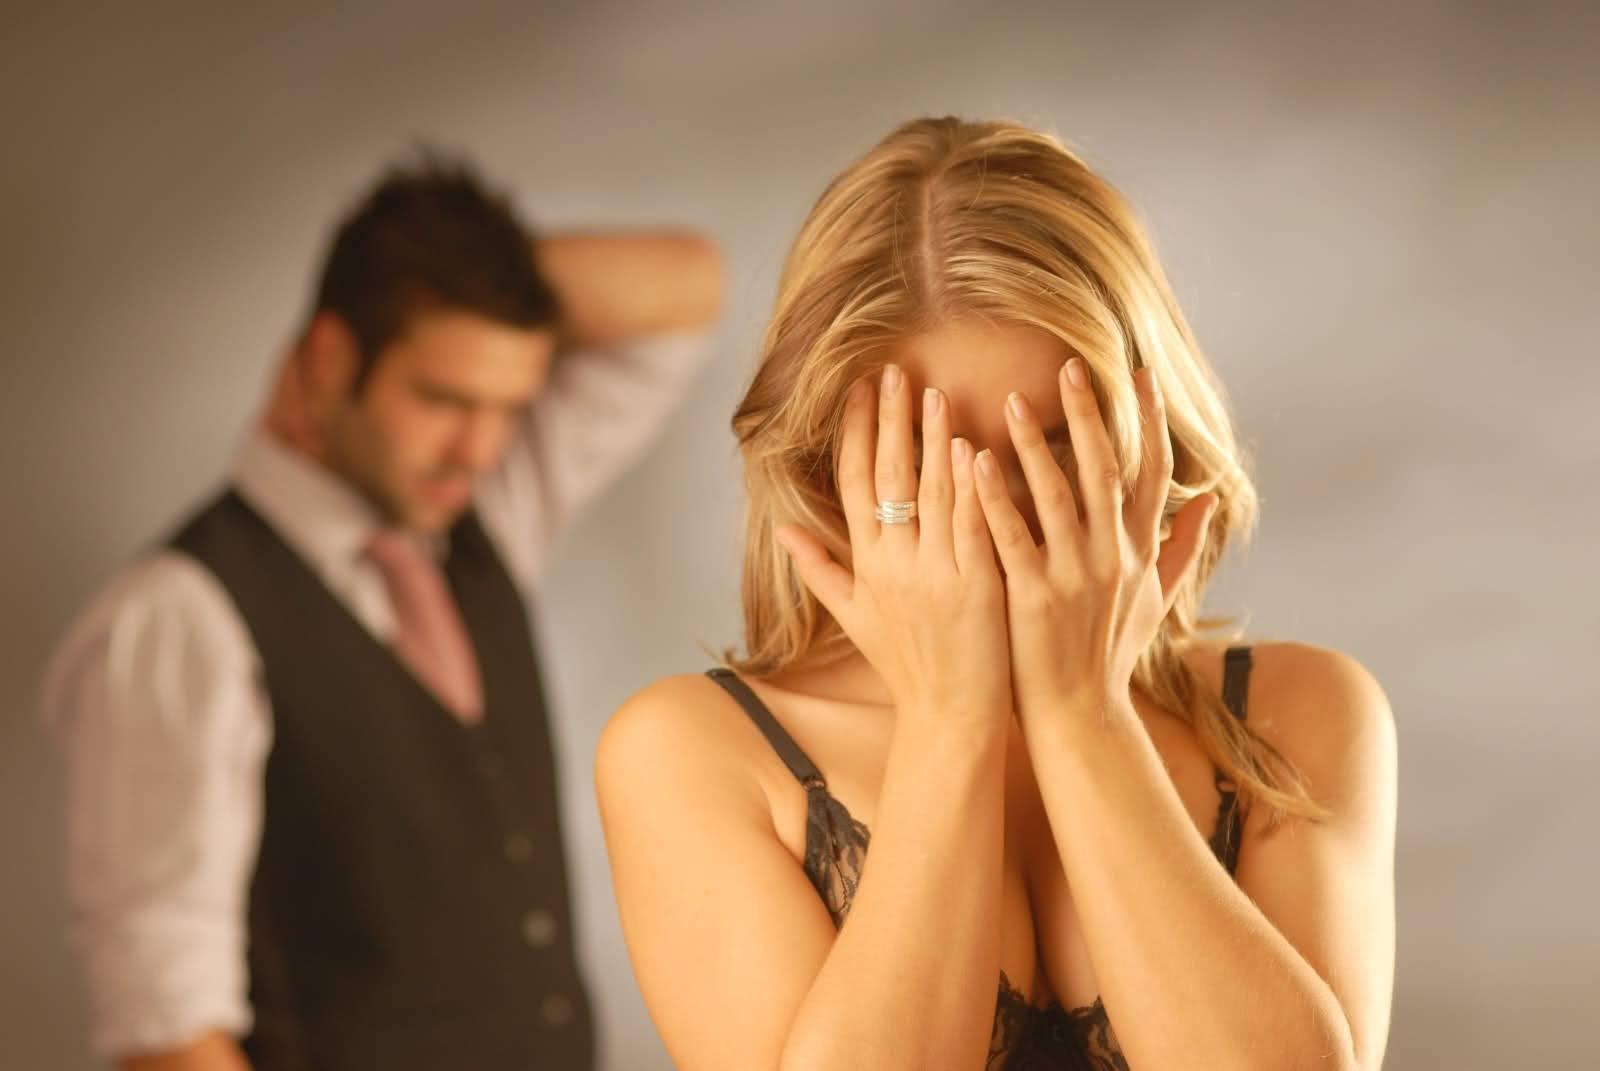 Влияние порнографии на брак